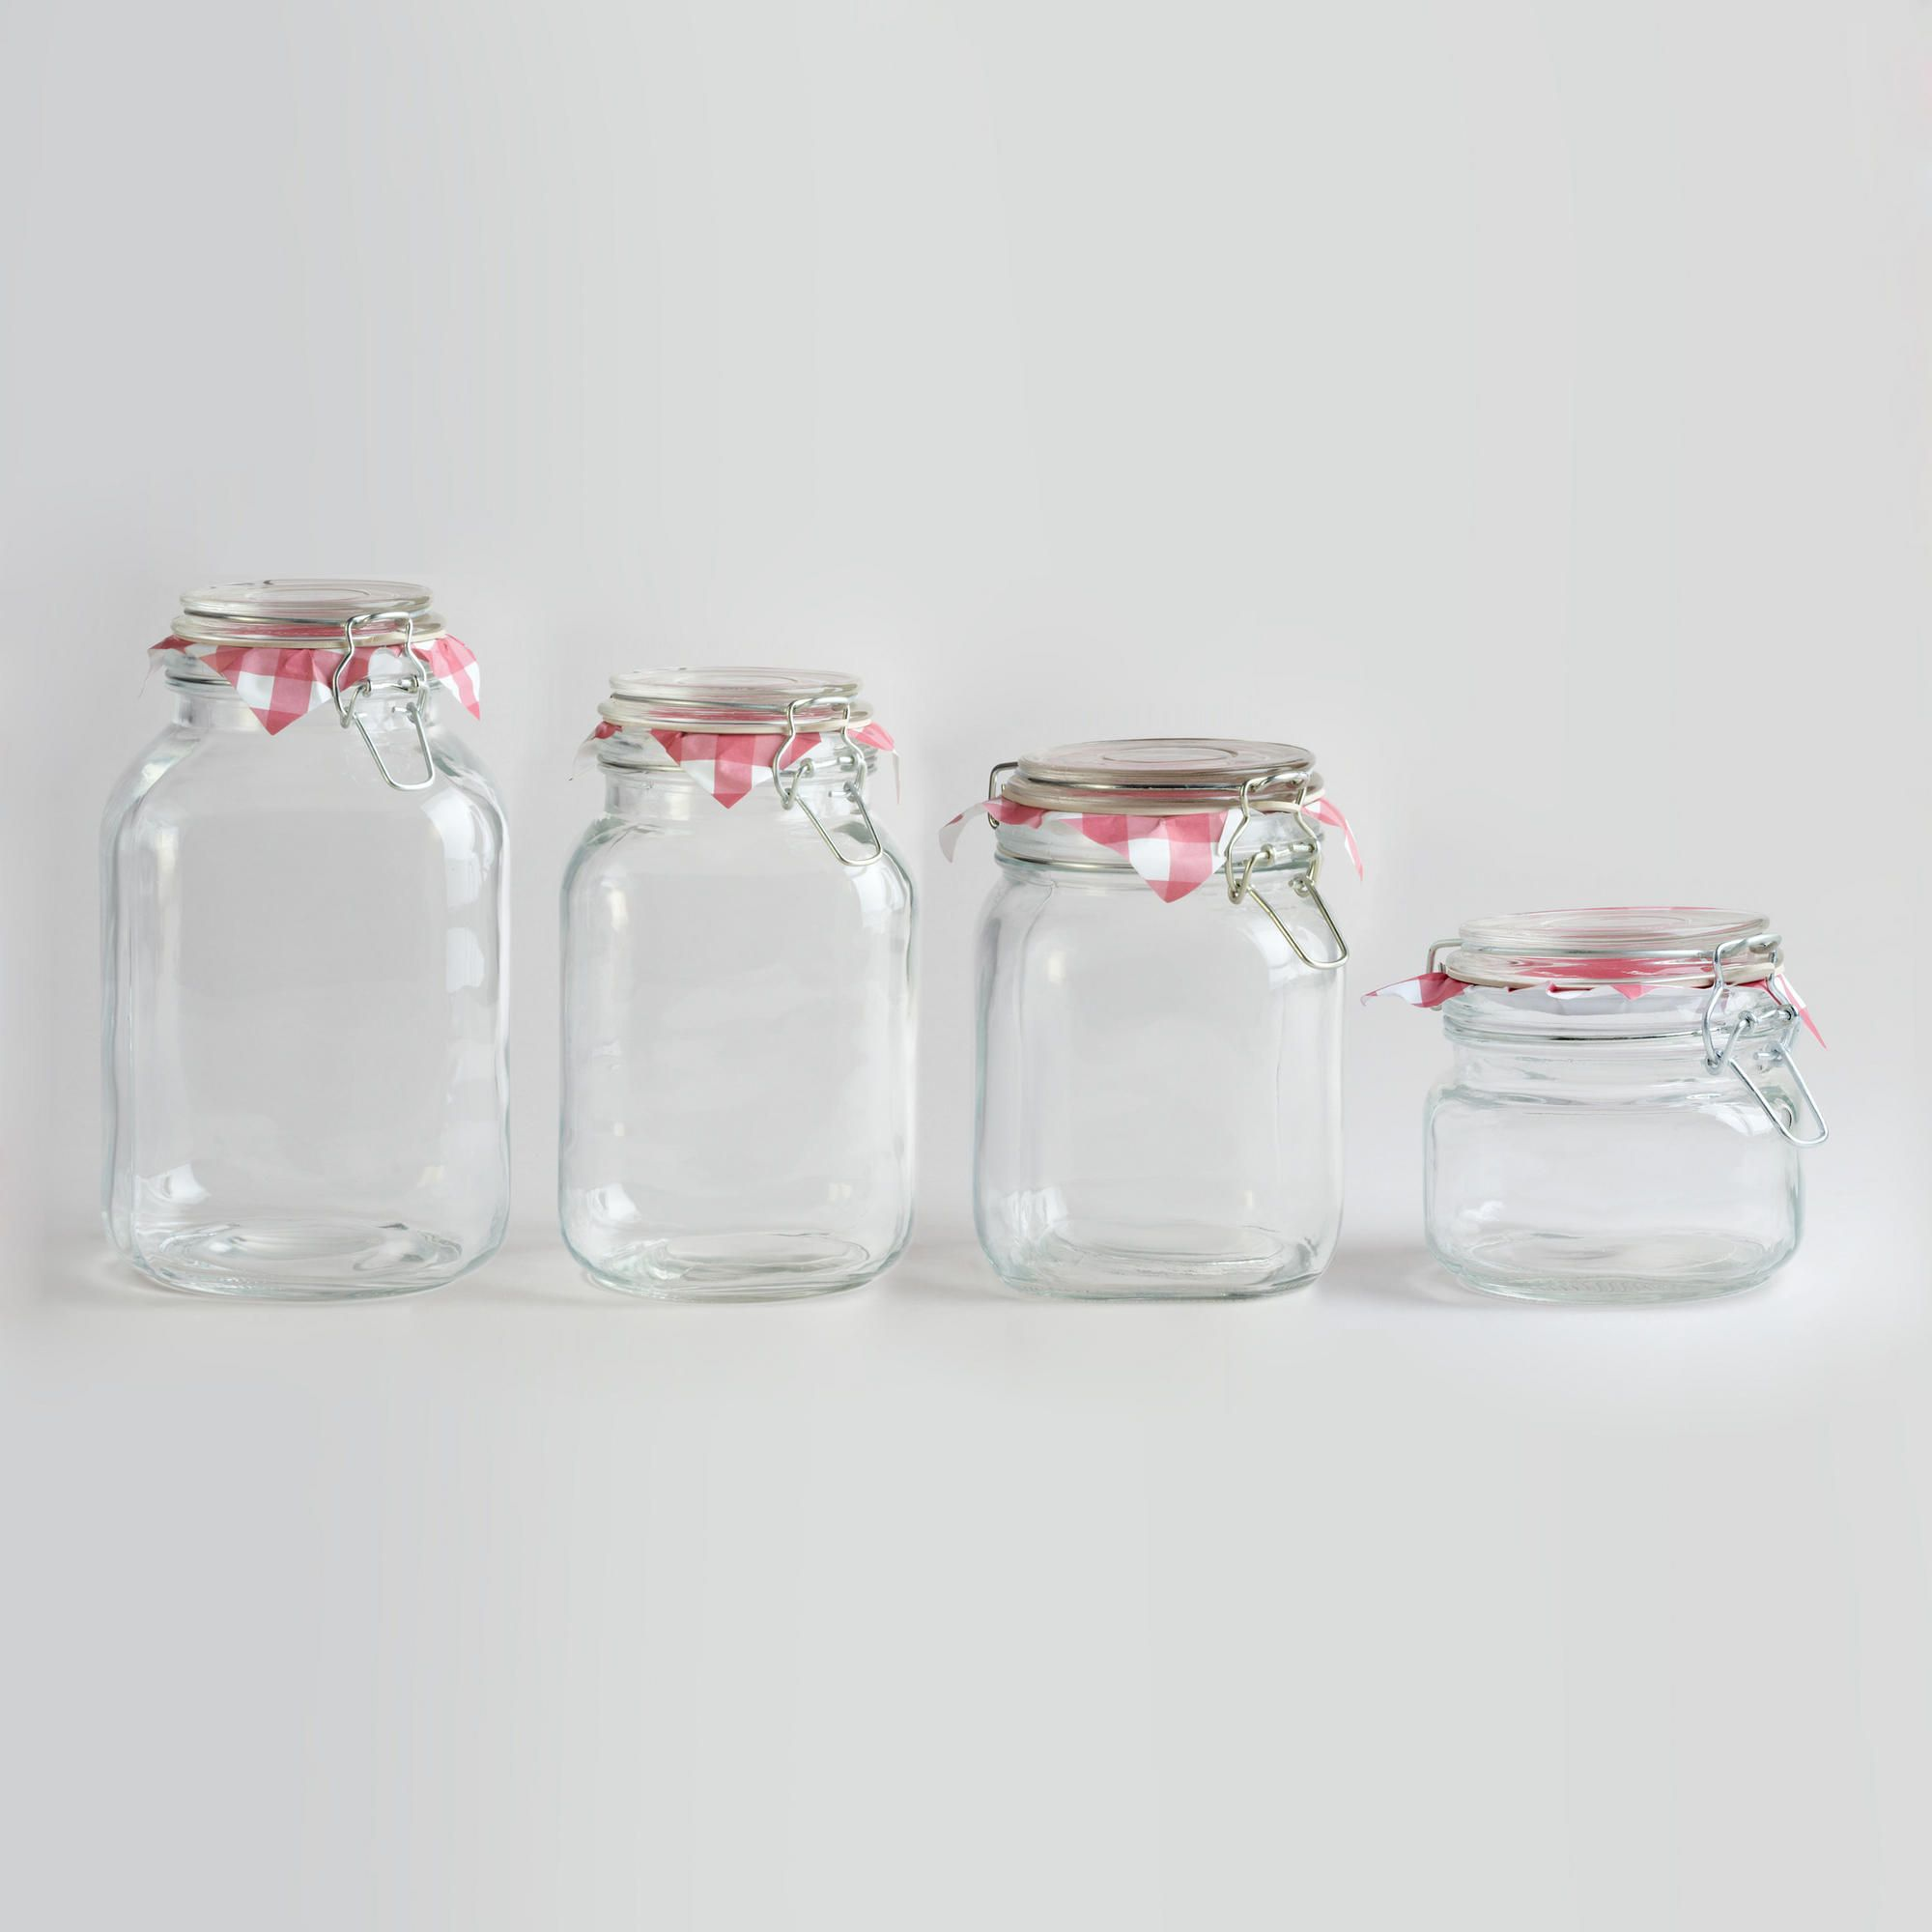 Fido Jars Available In 5 Liter 4 Liter 3 Liter 2 Liter 1 5 Liter 1 Liter 75 Liter 5 Liter Glass Ja Cheap Glass Jars Glass Jars Glass Jars With Lids